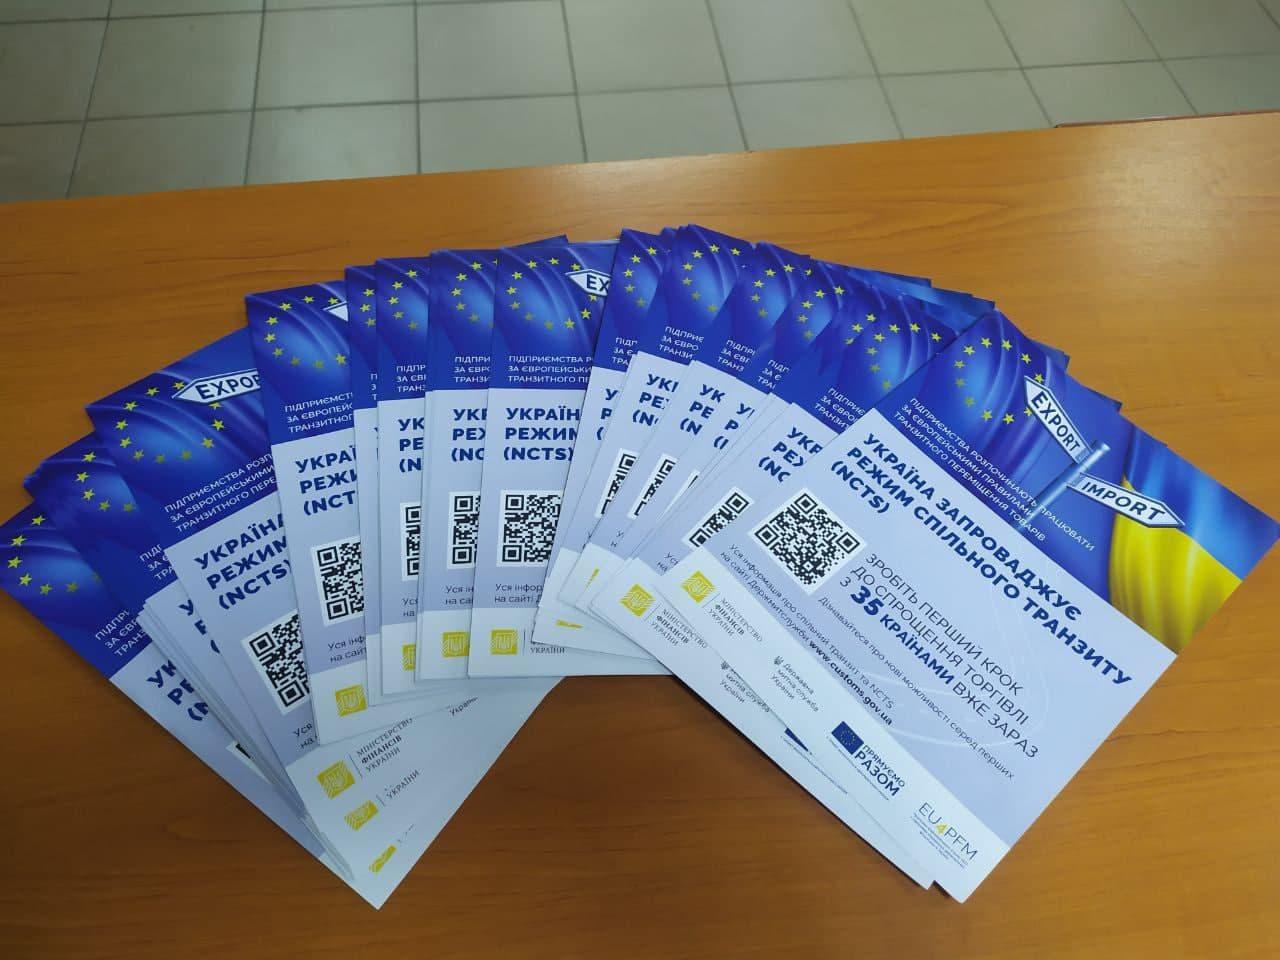 Ukraine introduces common transit regime (NCTS)